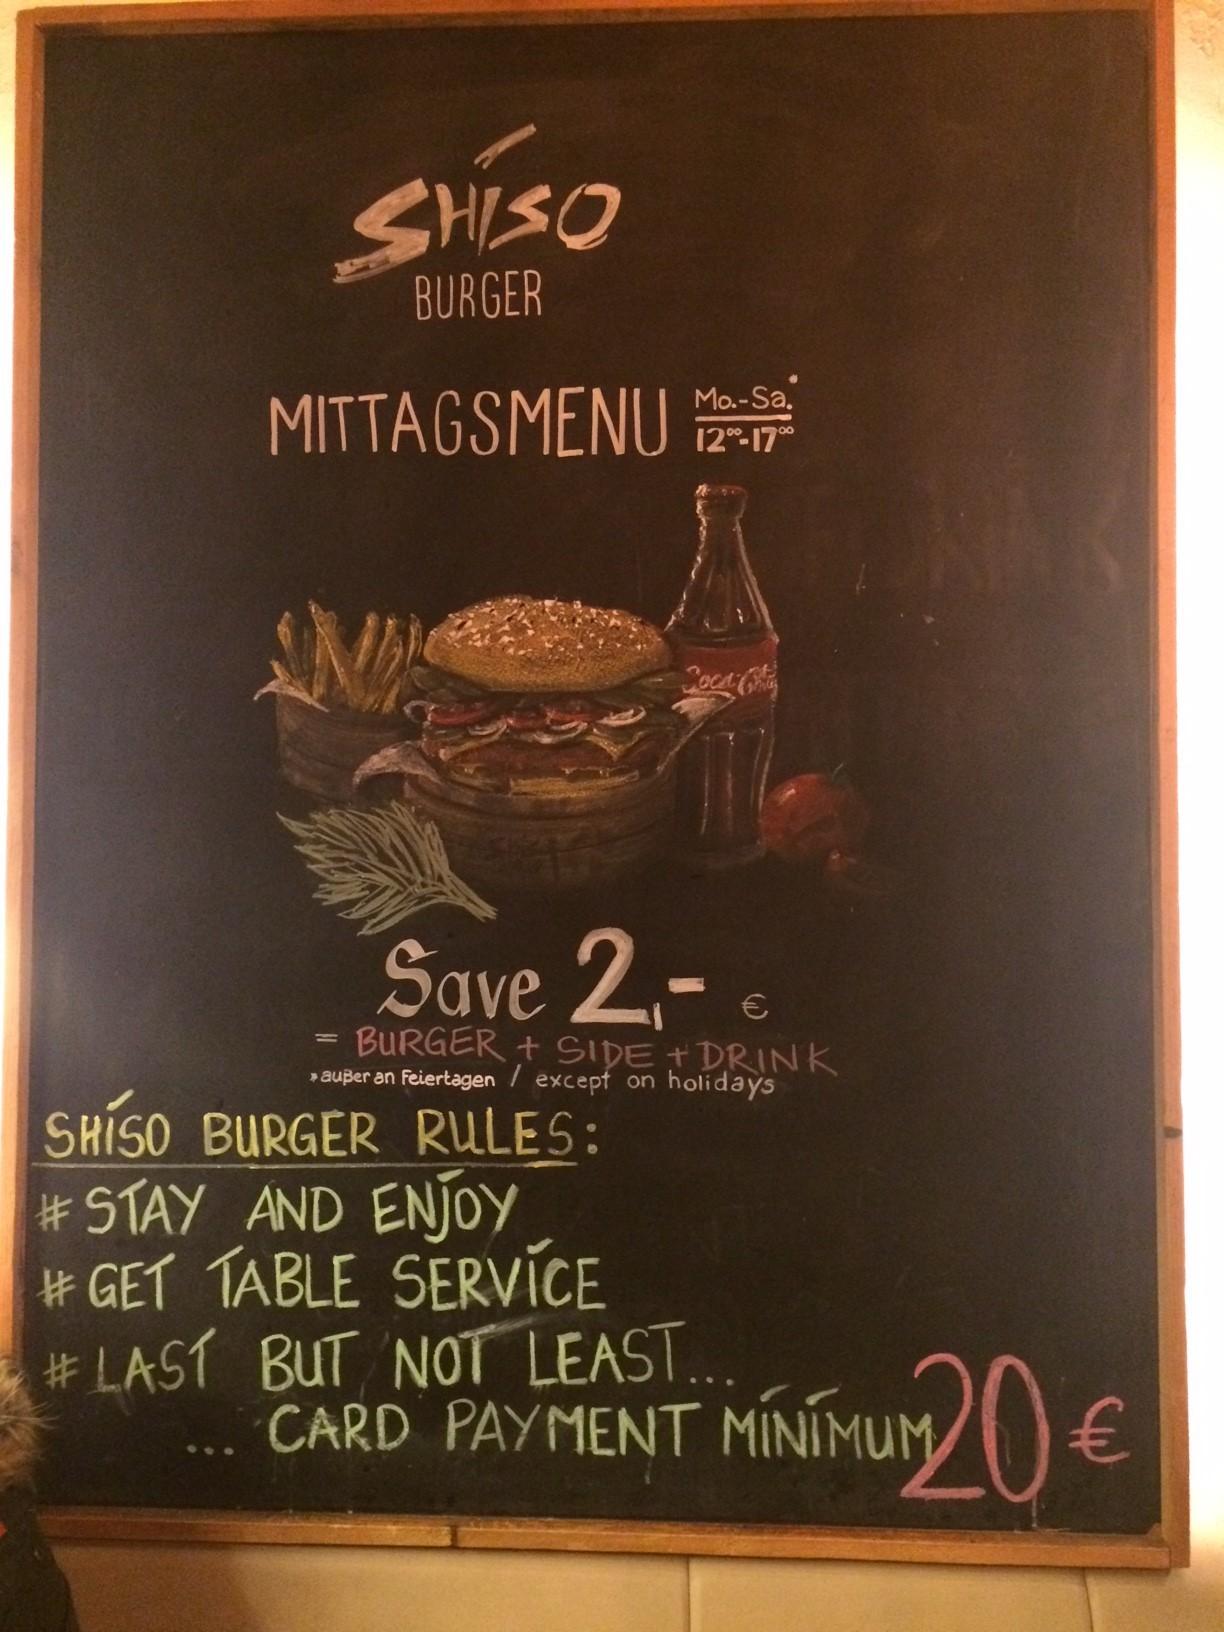 shisho-burger-f949a085f91a87621b9cb352ea